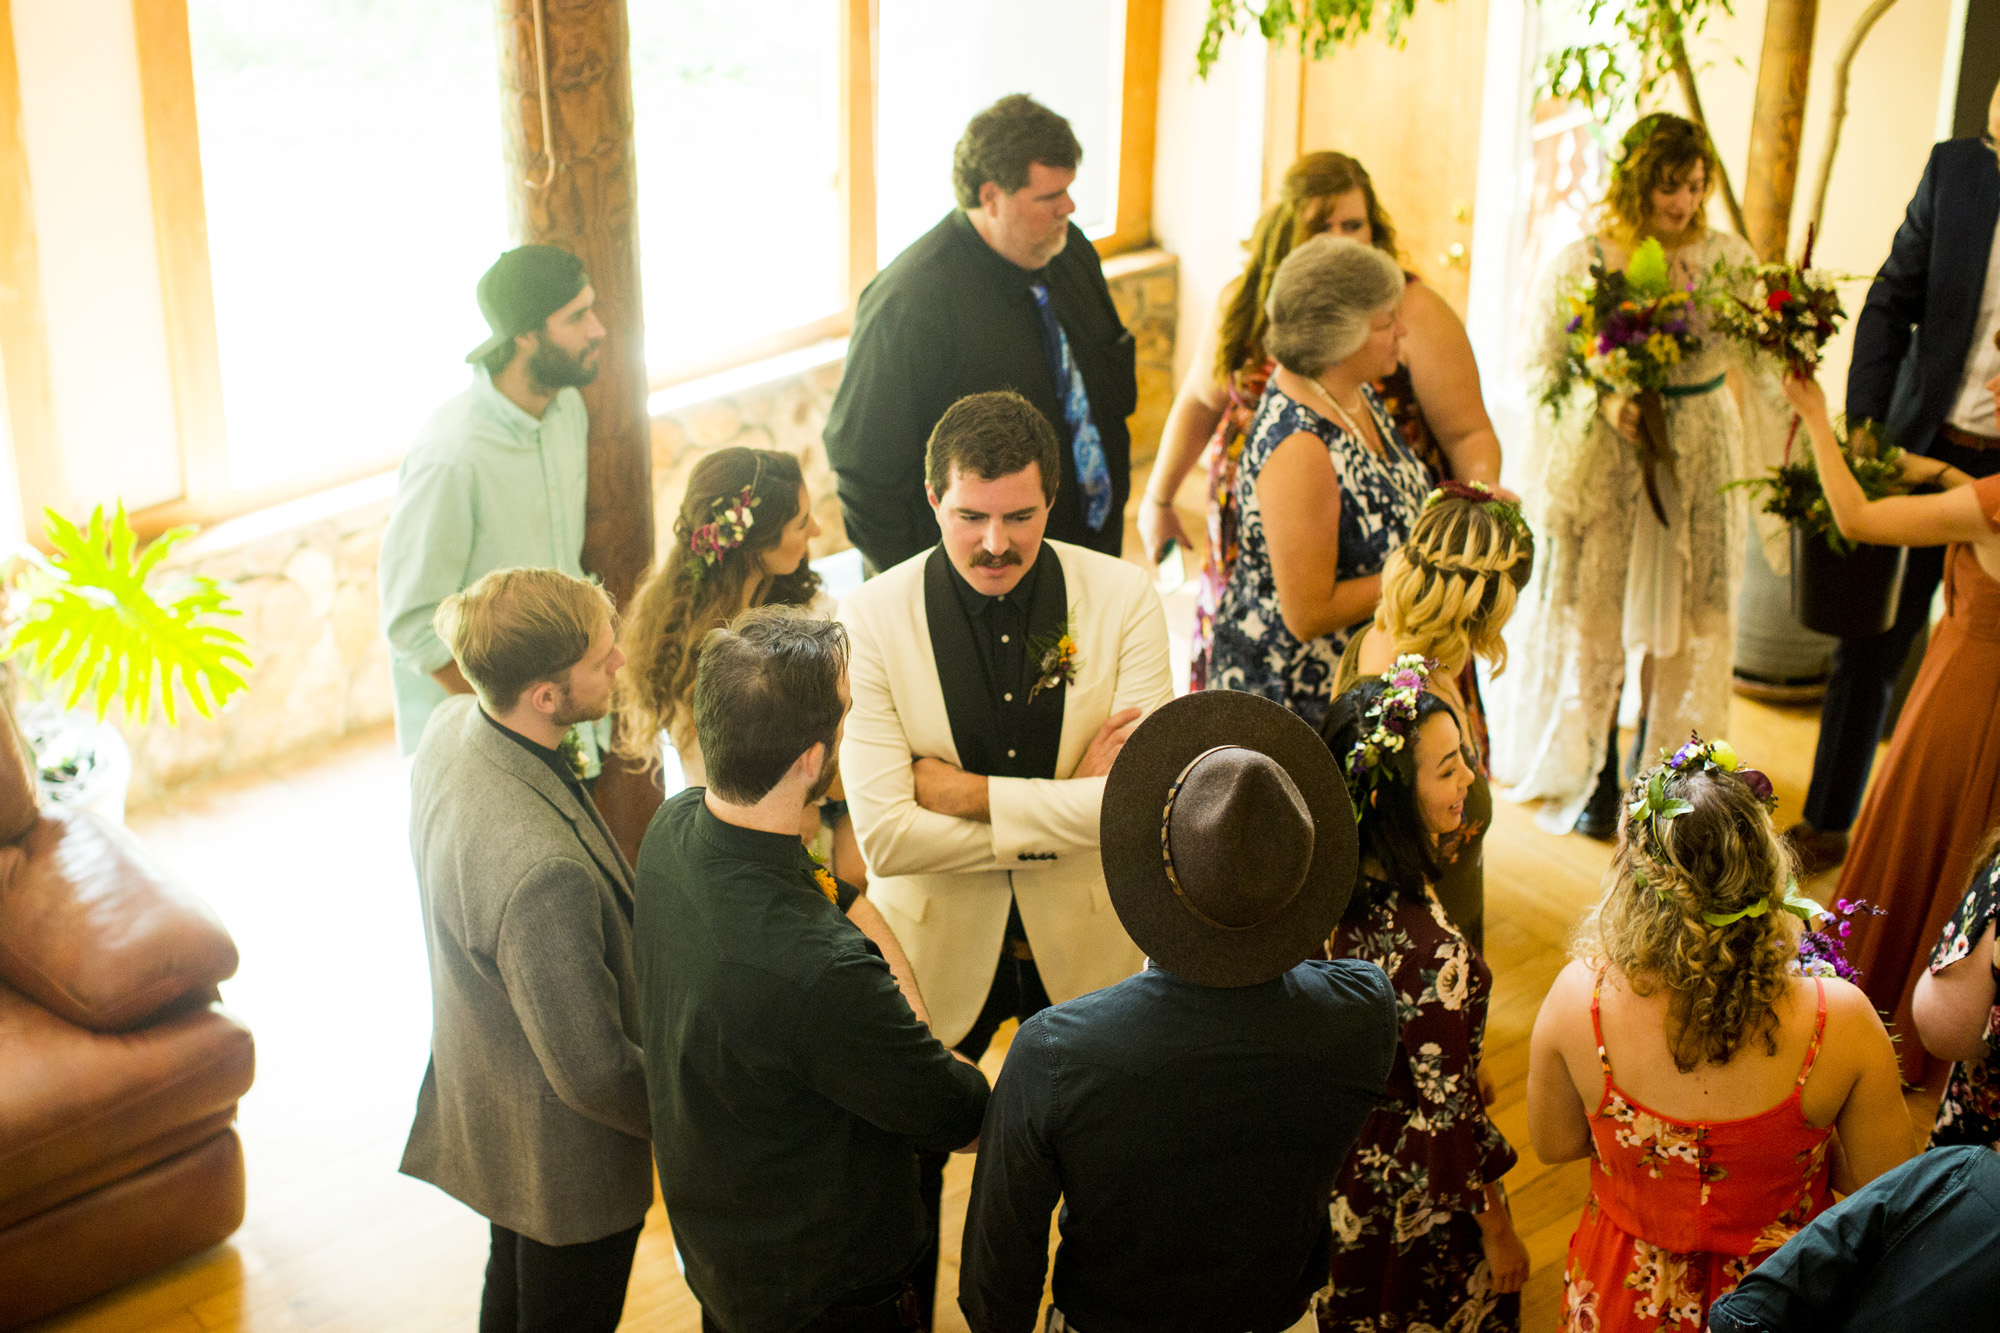 Seriously_Sabrina_Photography_Red_River_Gorge_Kentucky_Wedding_ShawnDana85.jpg